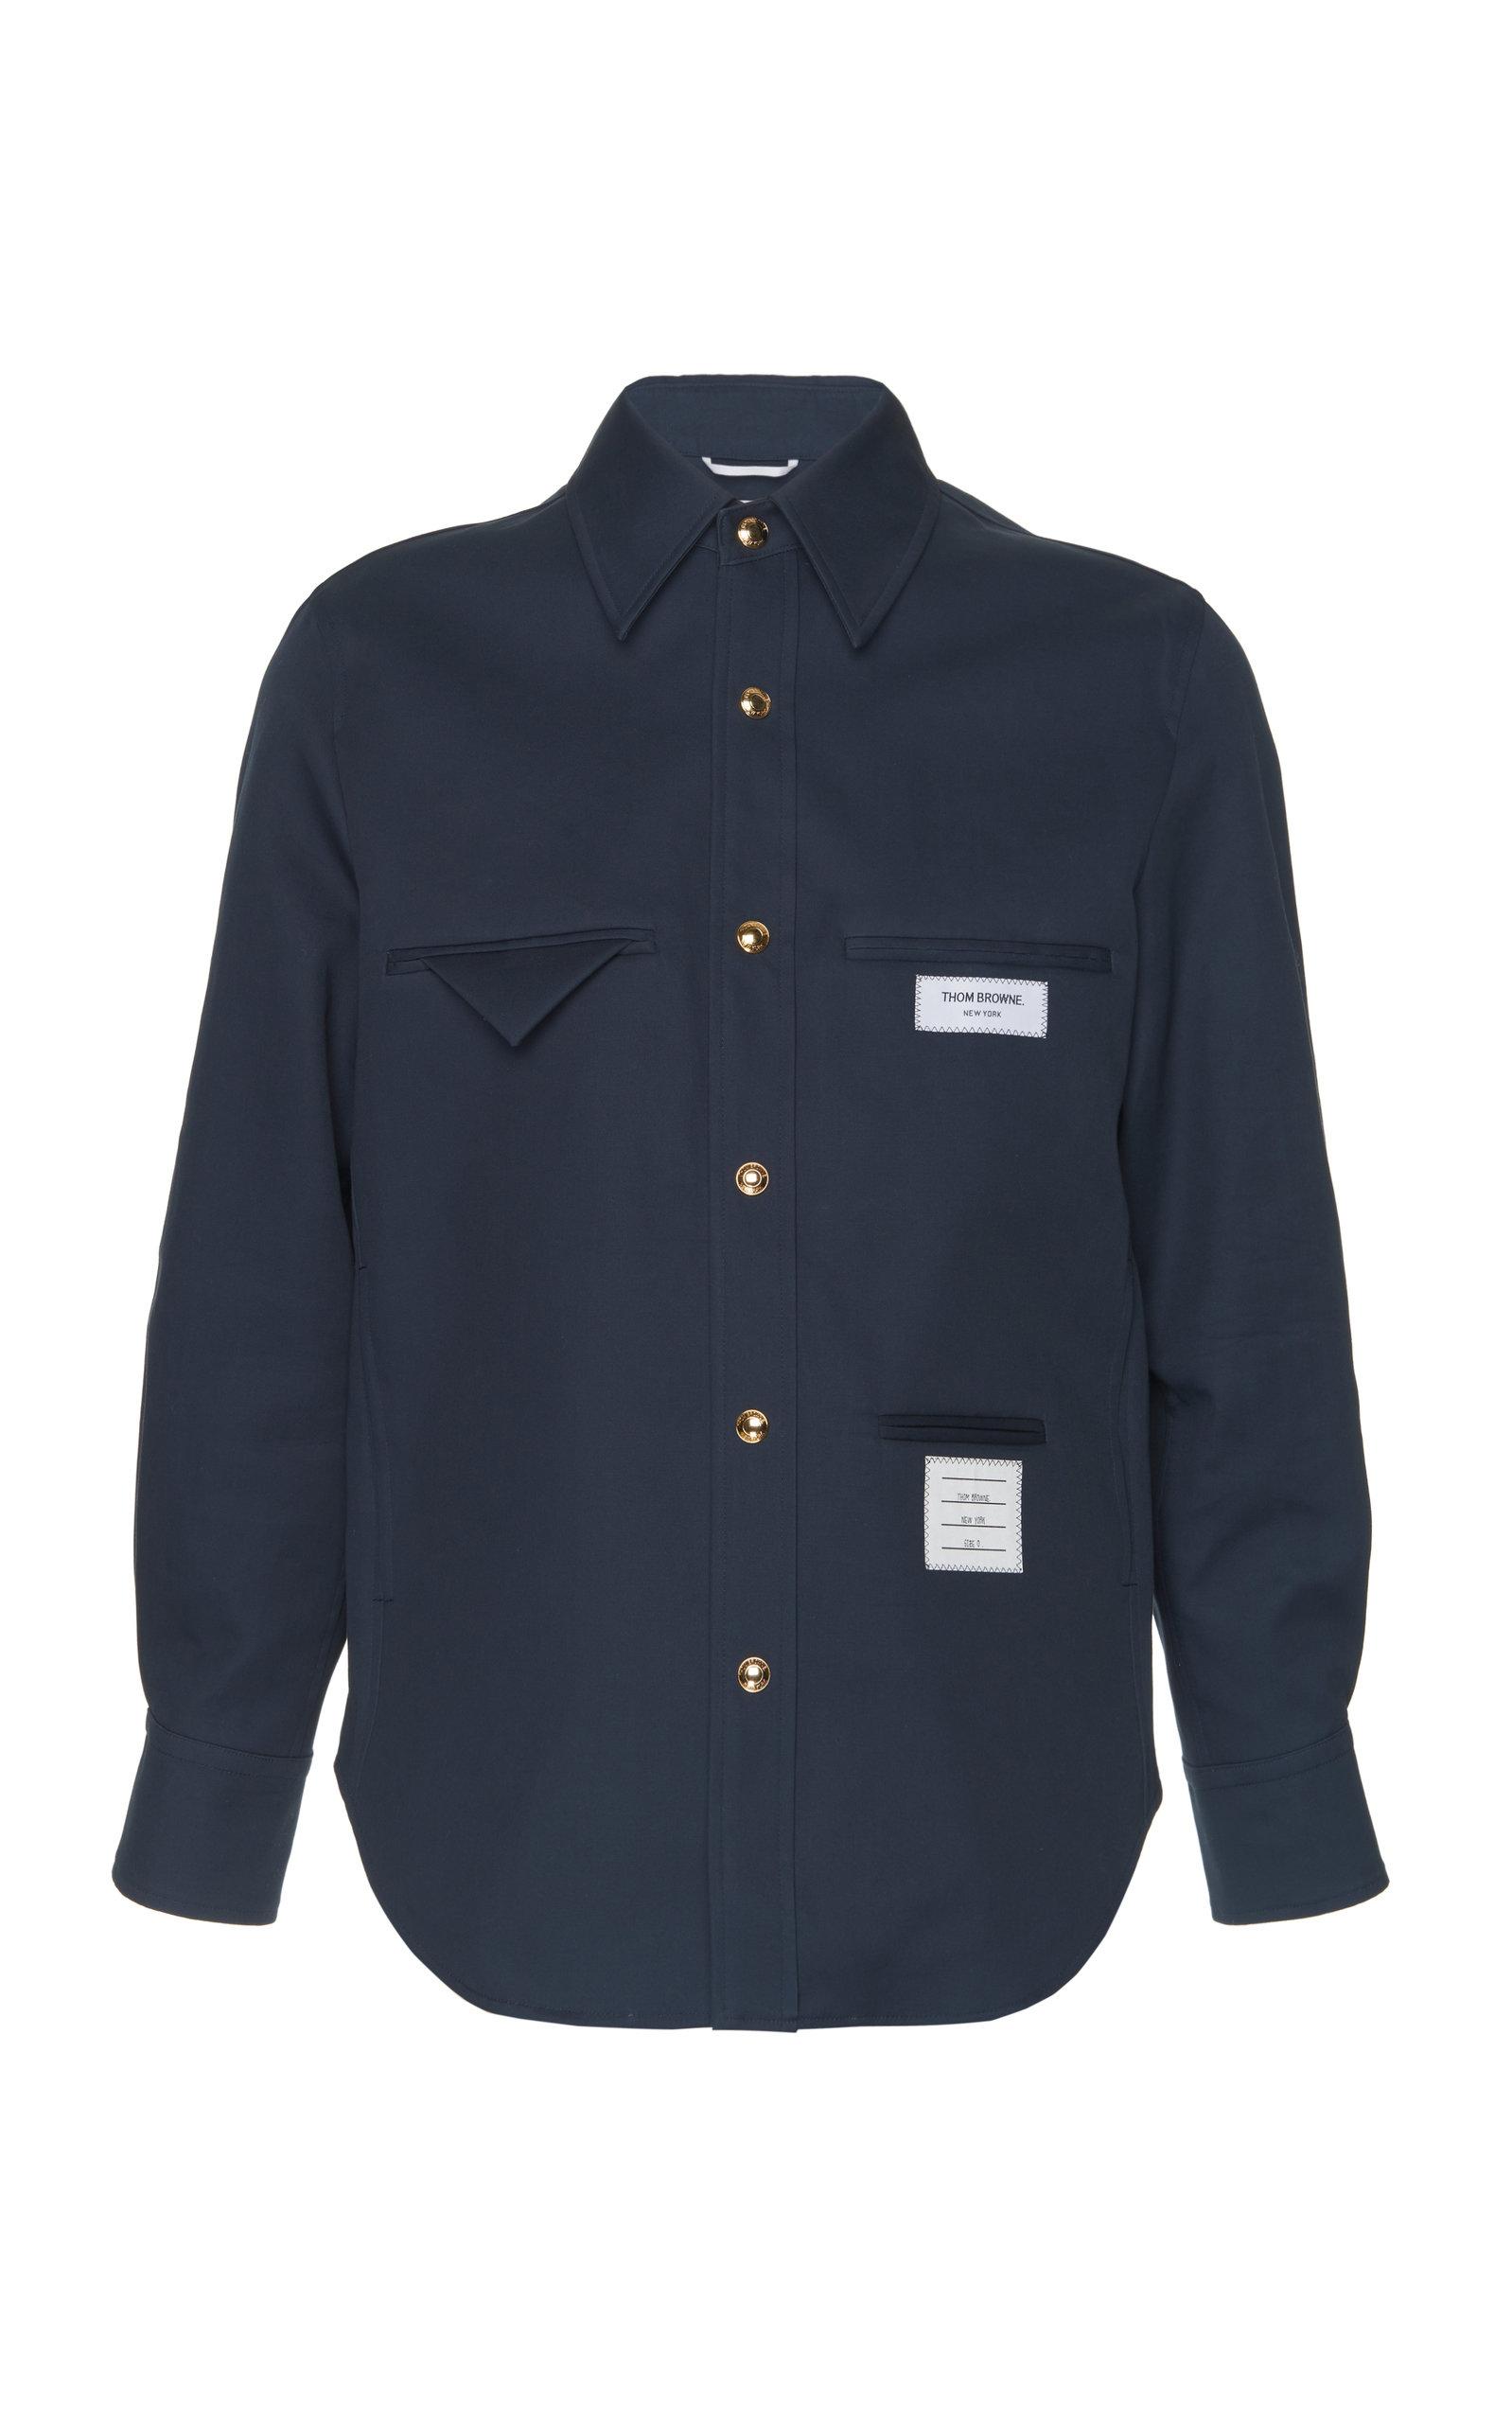 e9b4a592 Inside Out Cotton Shirt Jacket by Thom Browne | Moda Operandi